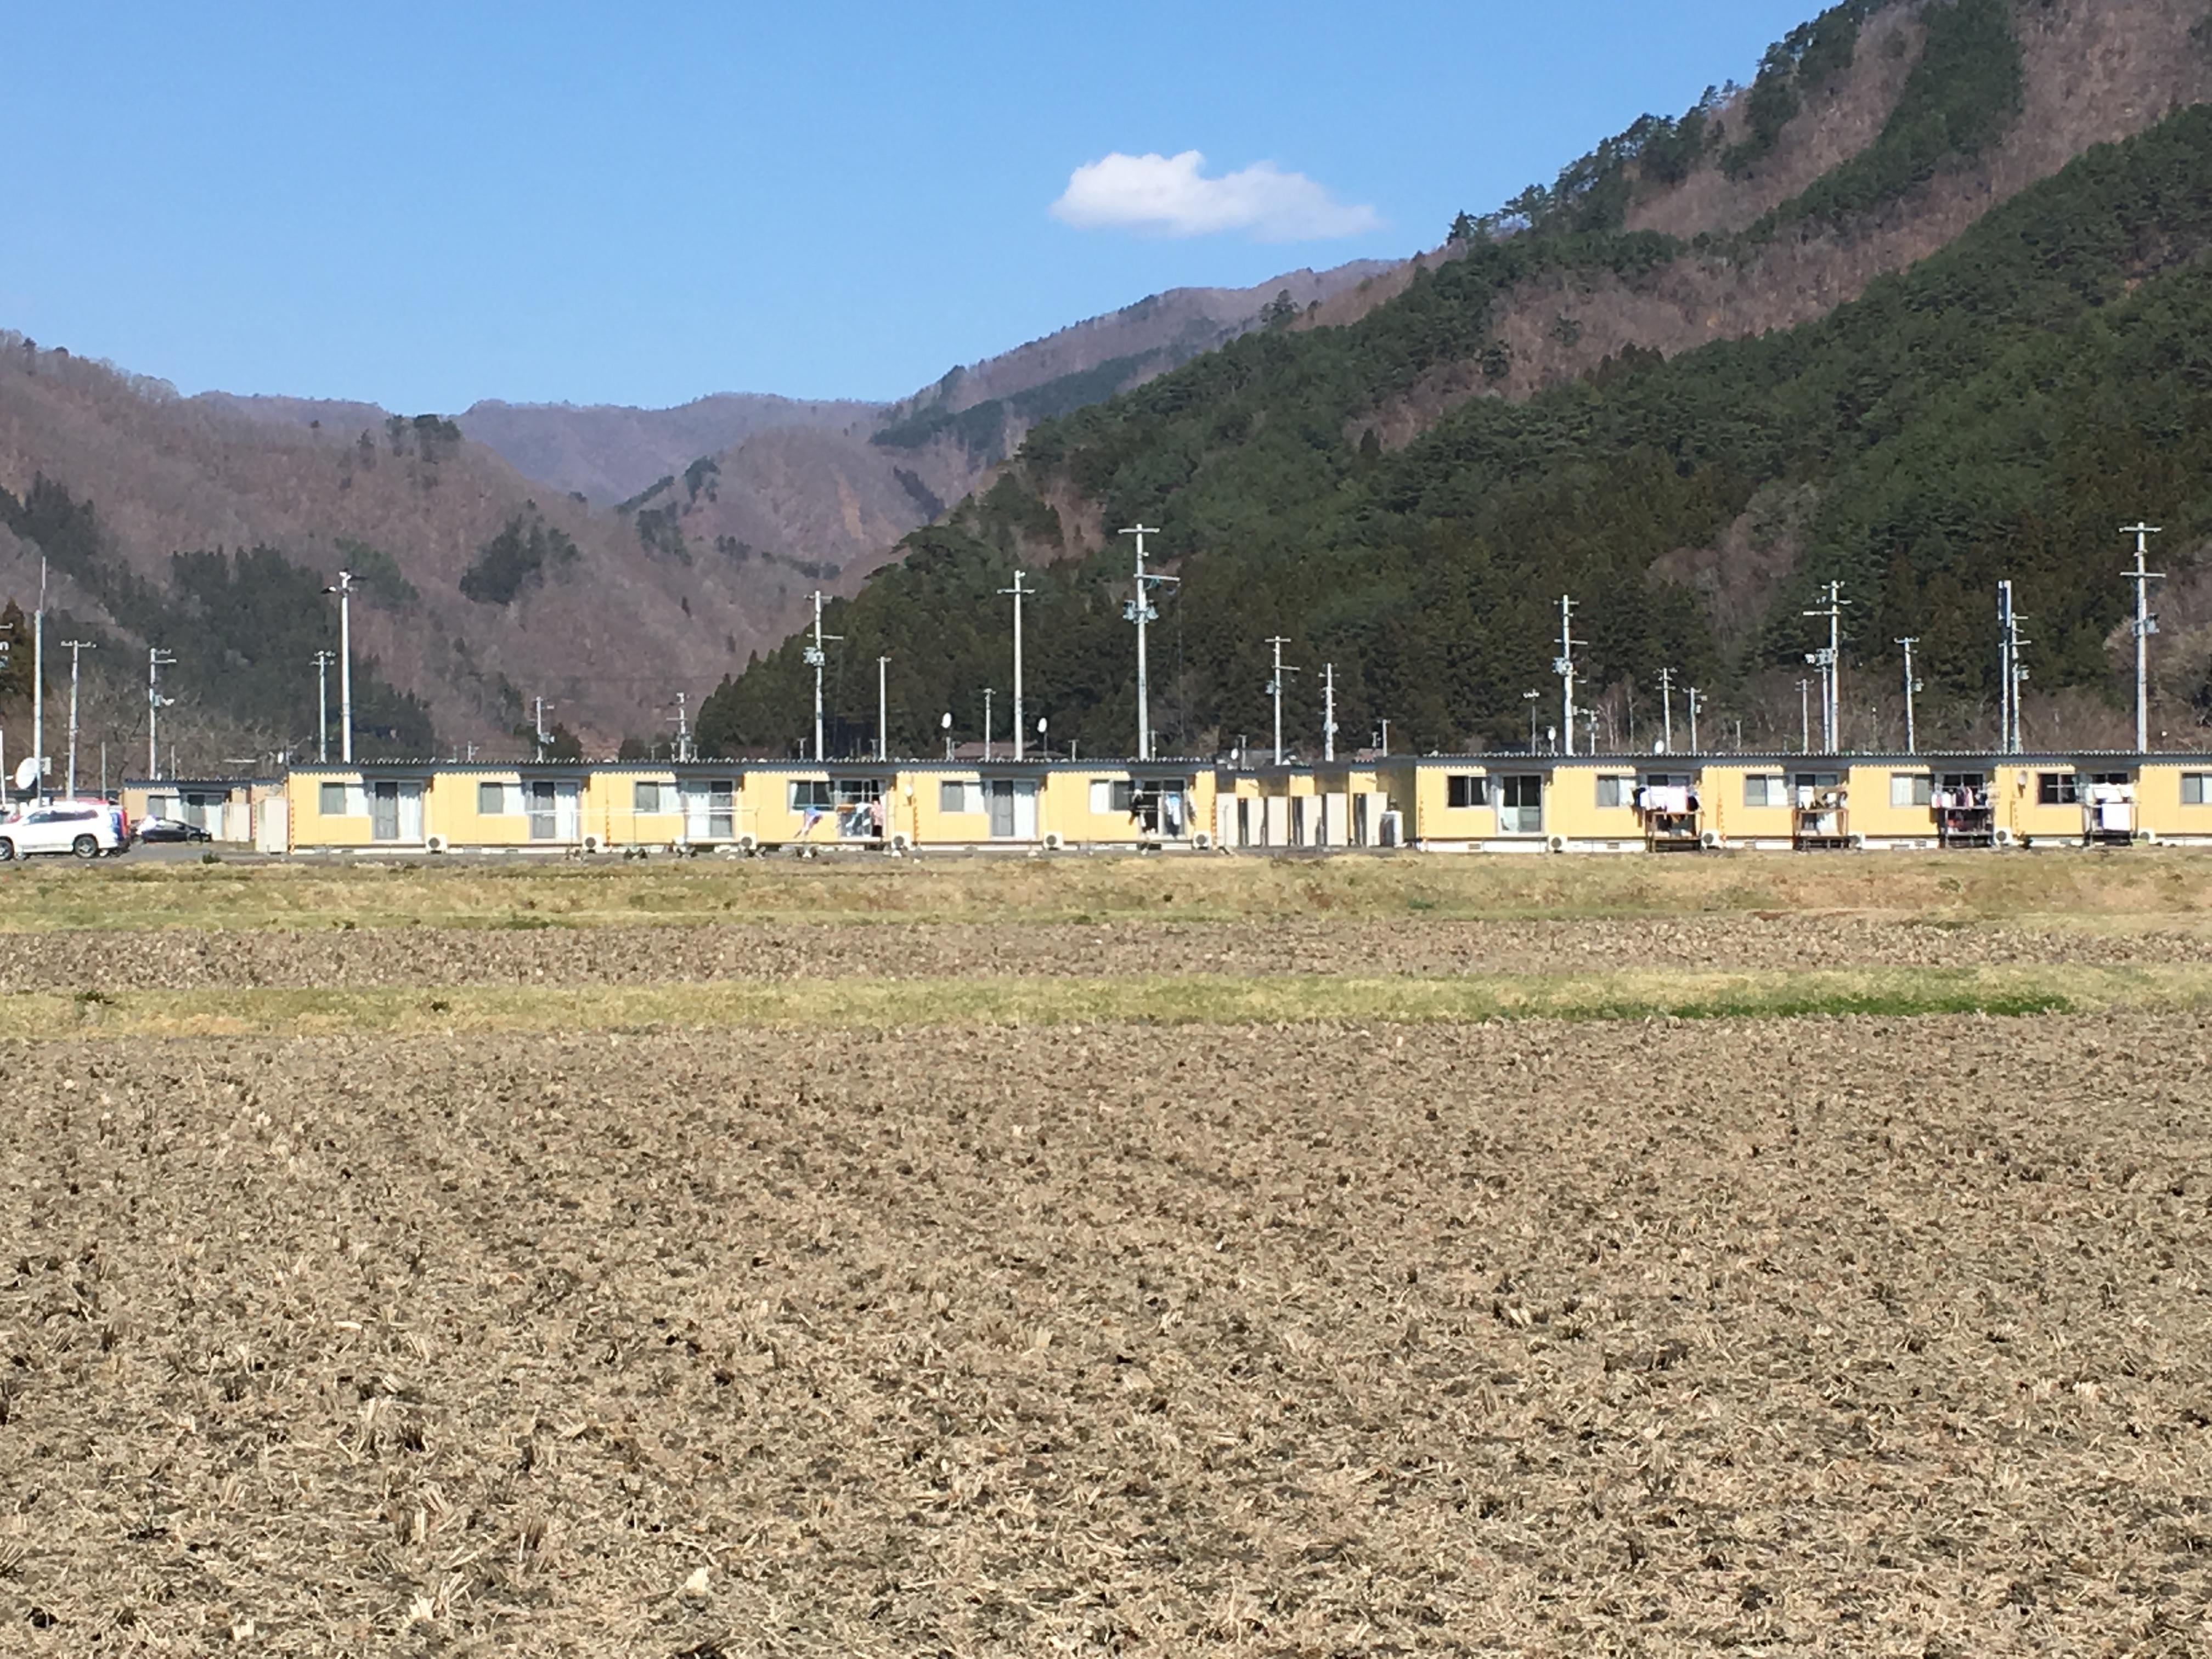 otsuchi temporary housing compound 2016.JPG